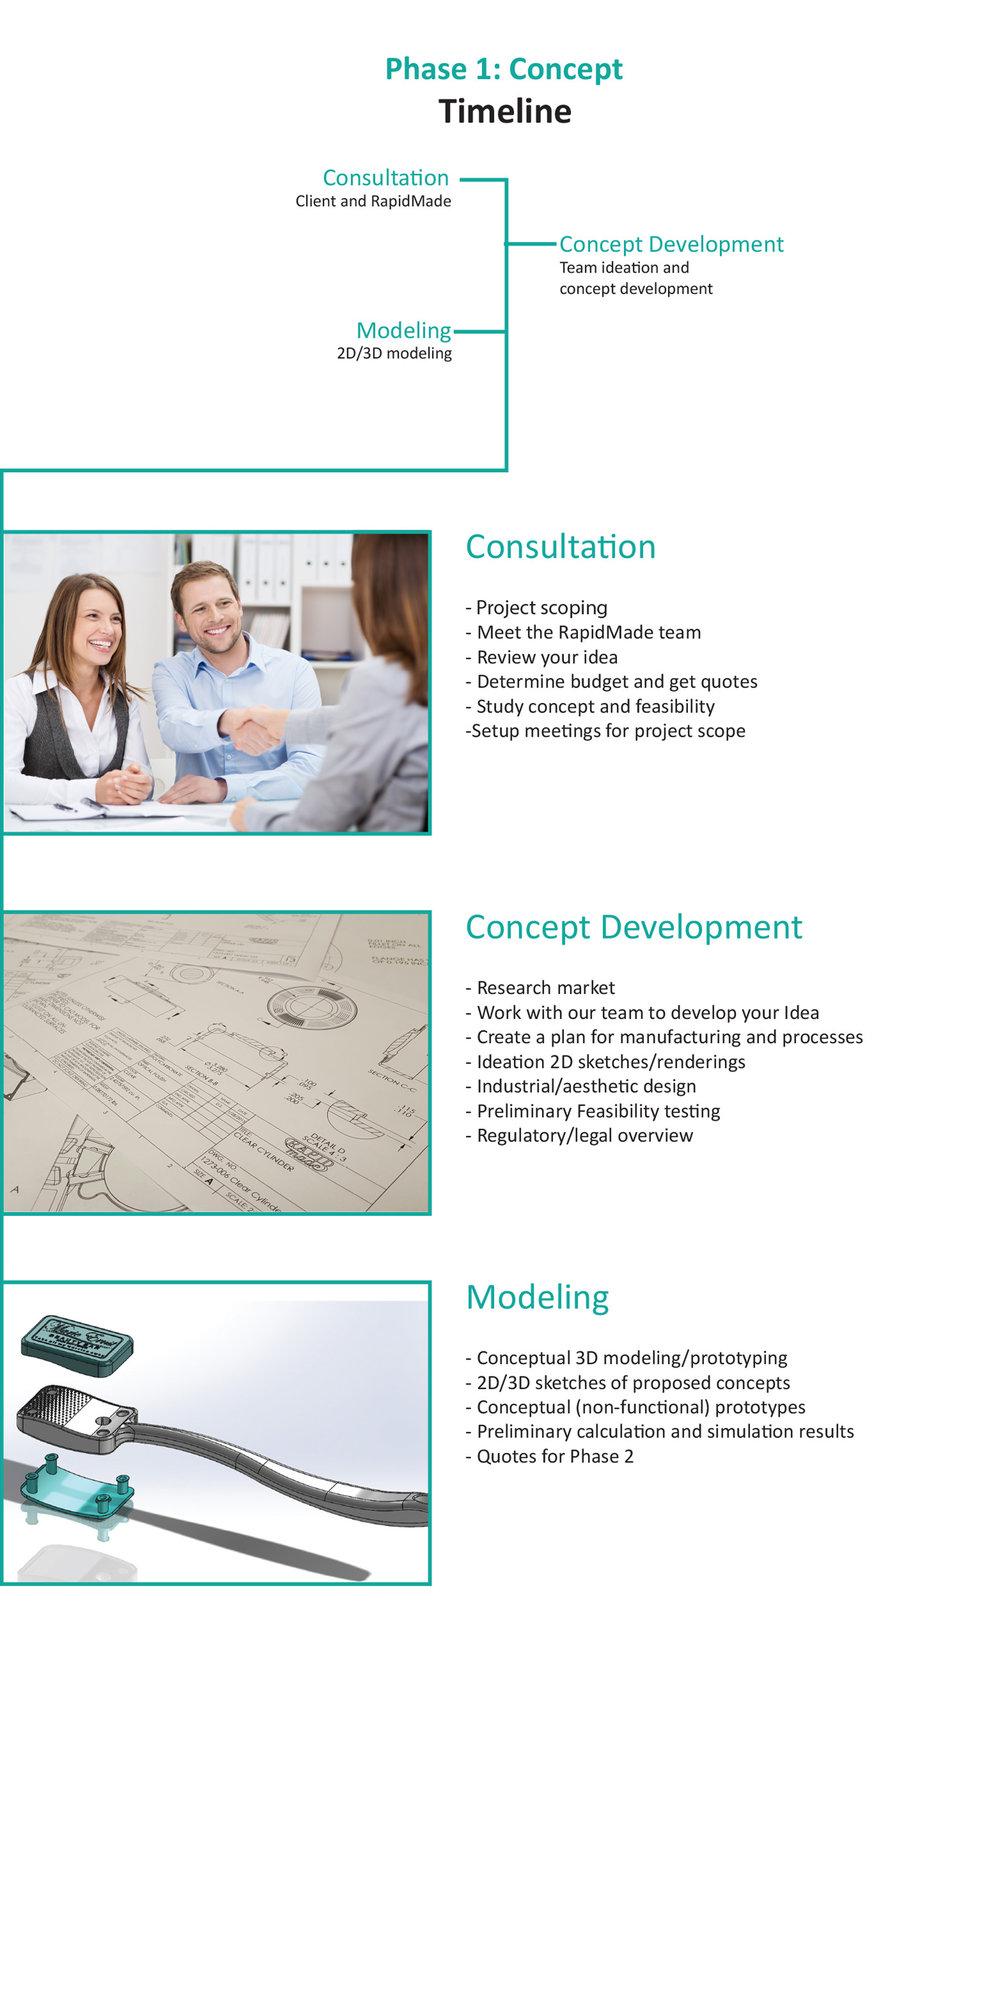 Design-process-timeline-concept-consultation-concept-development-modeling